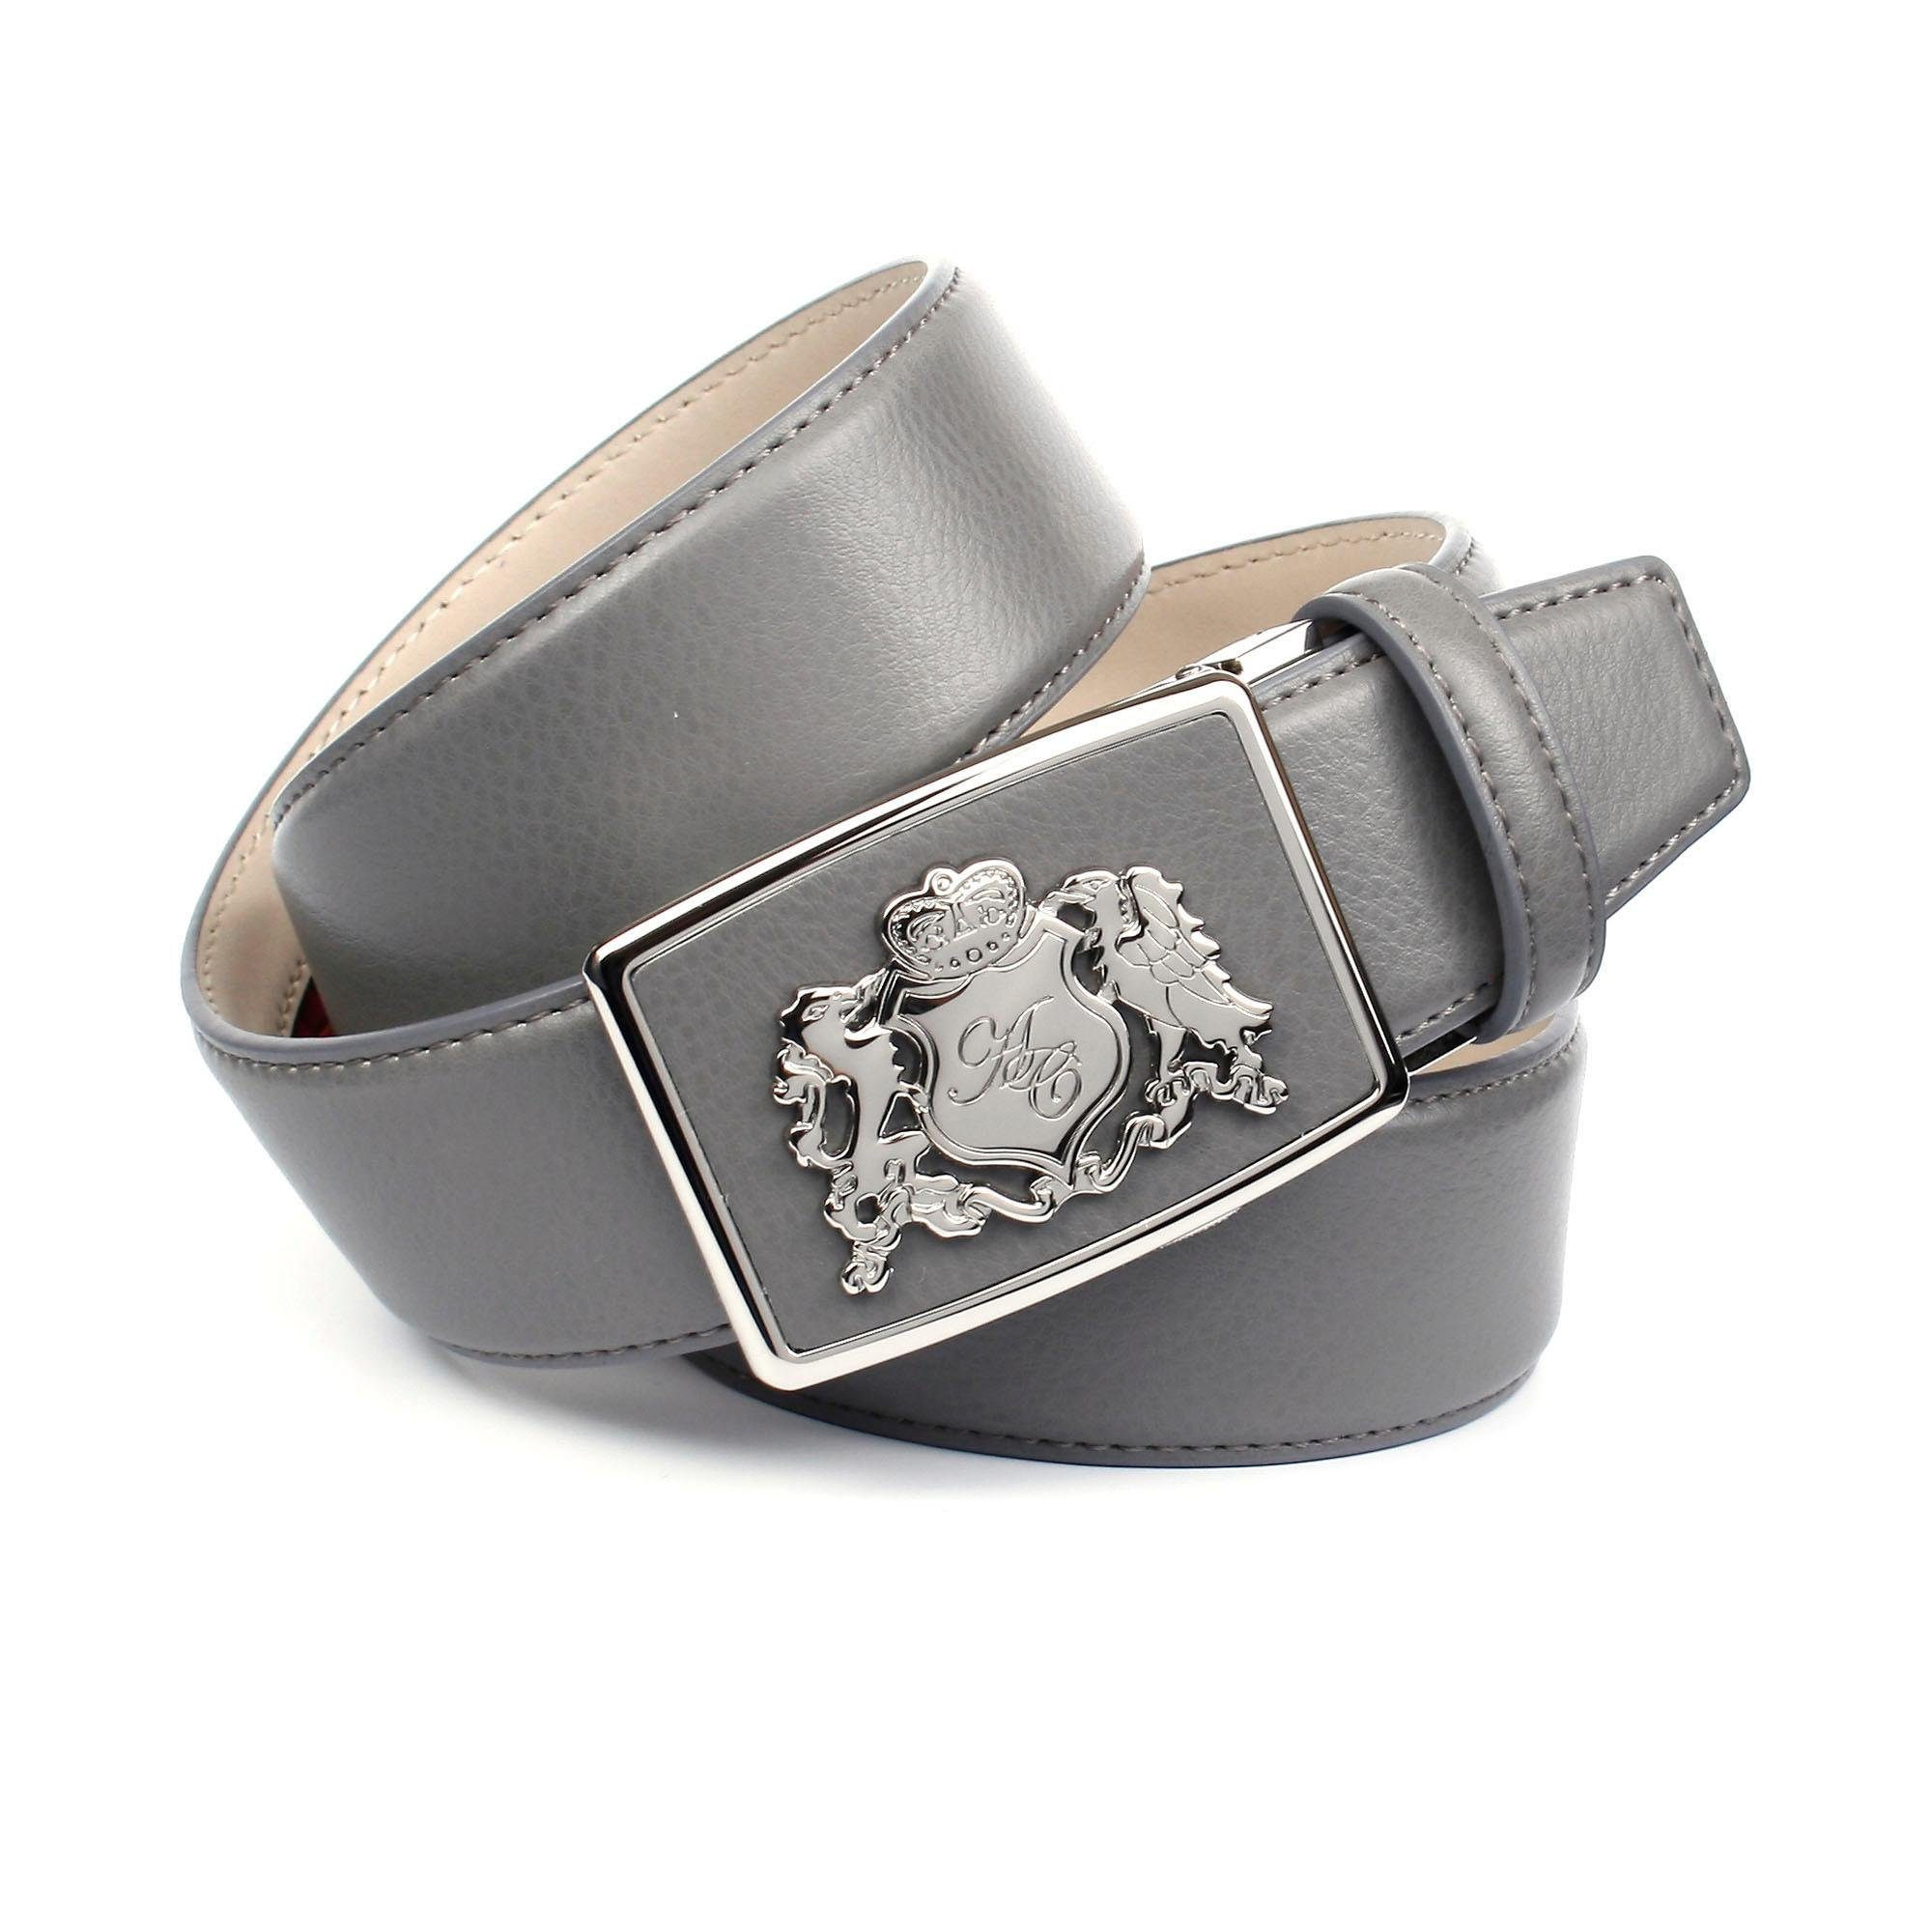 Anthoni Crown Ledergürtel, mit Wappen, bombiert grau Damen Ledergürtel Gürtel Accessoires